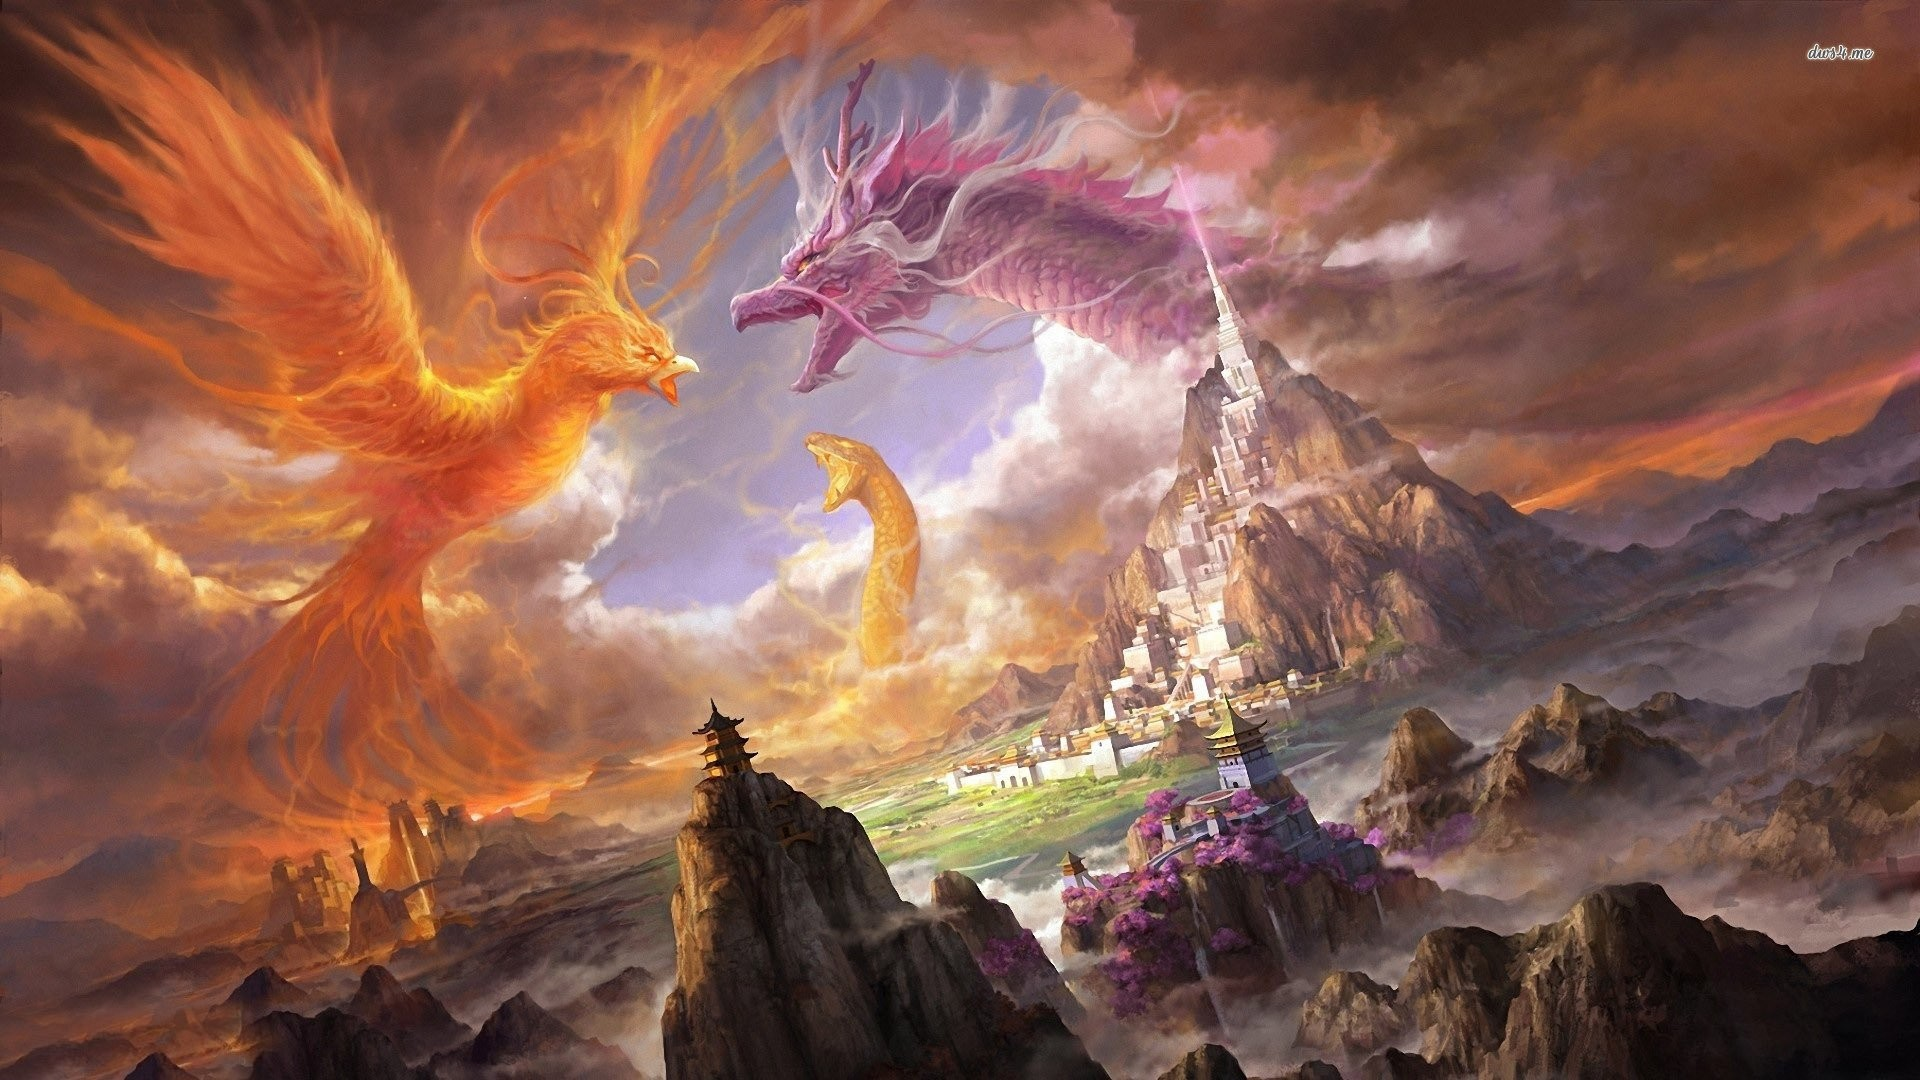 Samsung Galaxy S5 Wallpaper: Spyro The Dragon Wallpaper (68+ Images